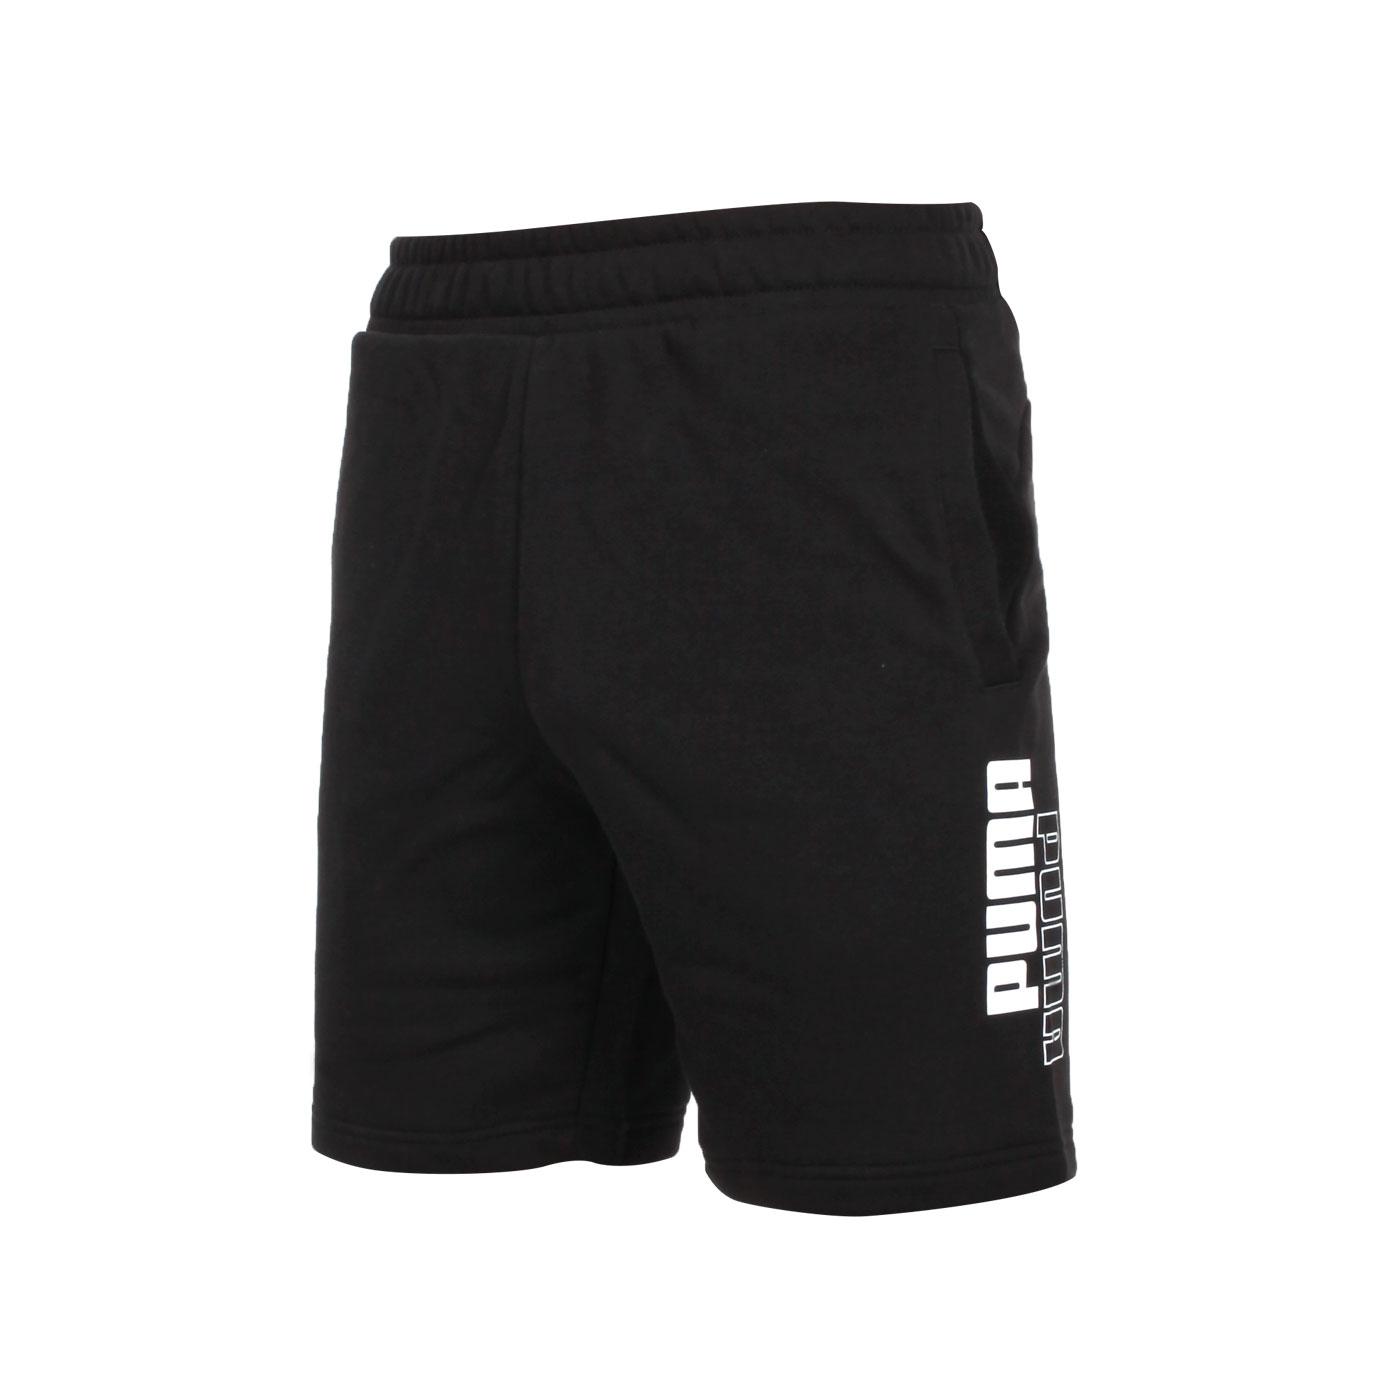 PUMA 基本系列Power Logo男款8吋短褲 58941301 - 黑白